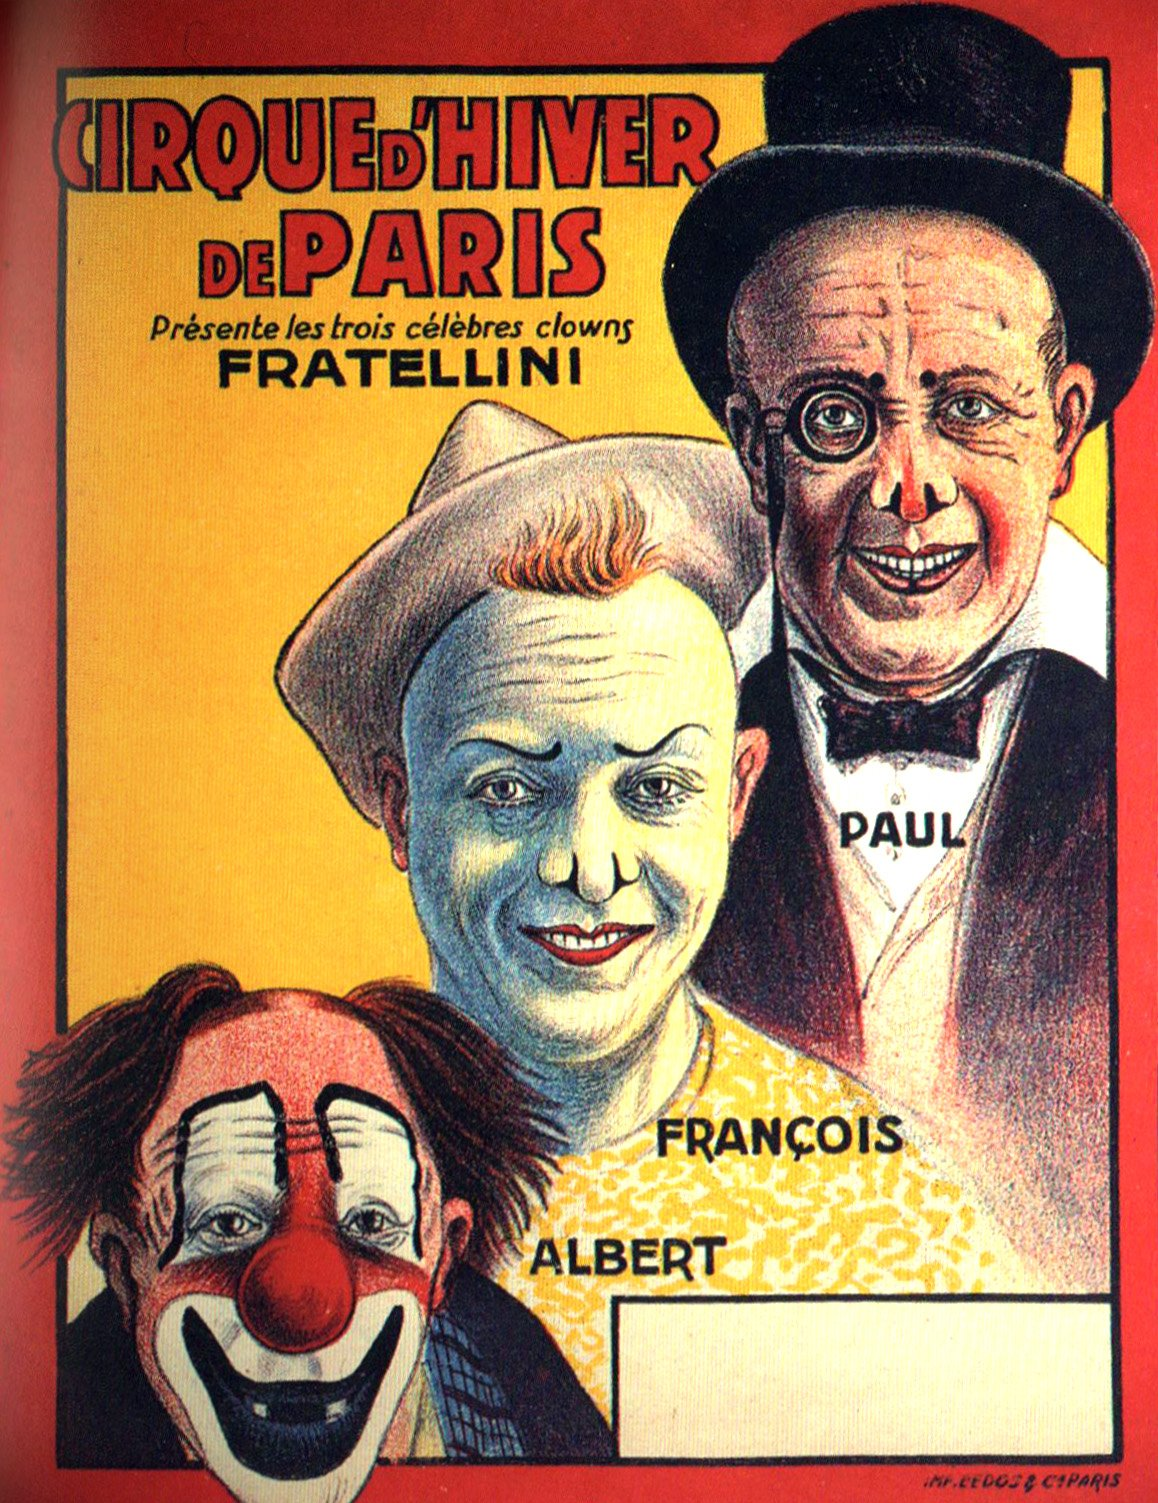 Fratellini poster